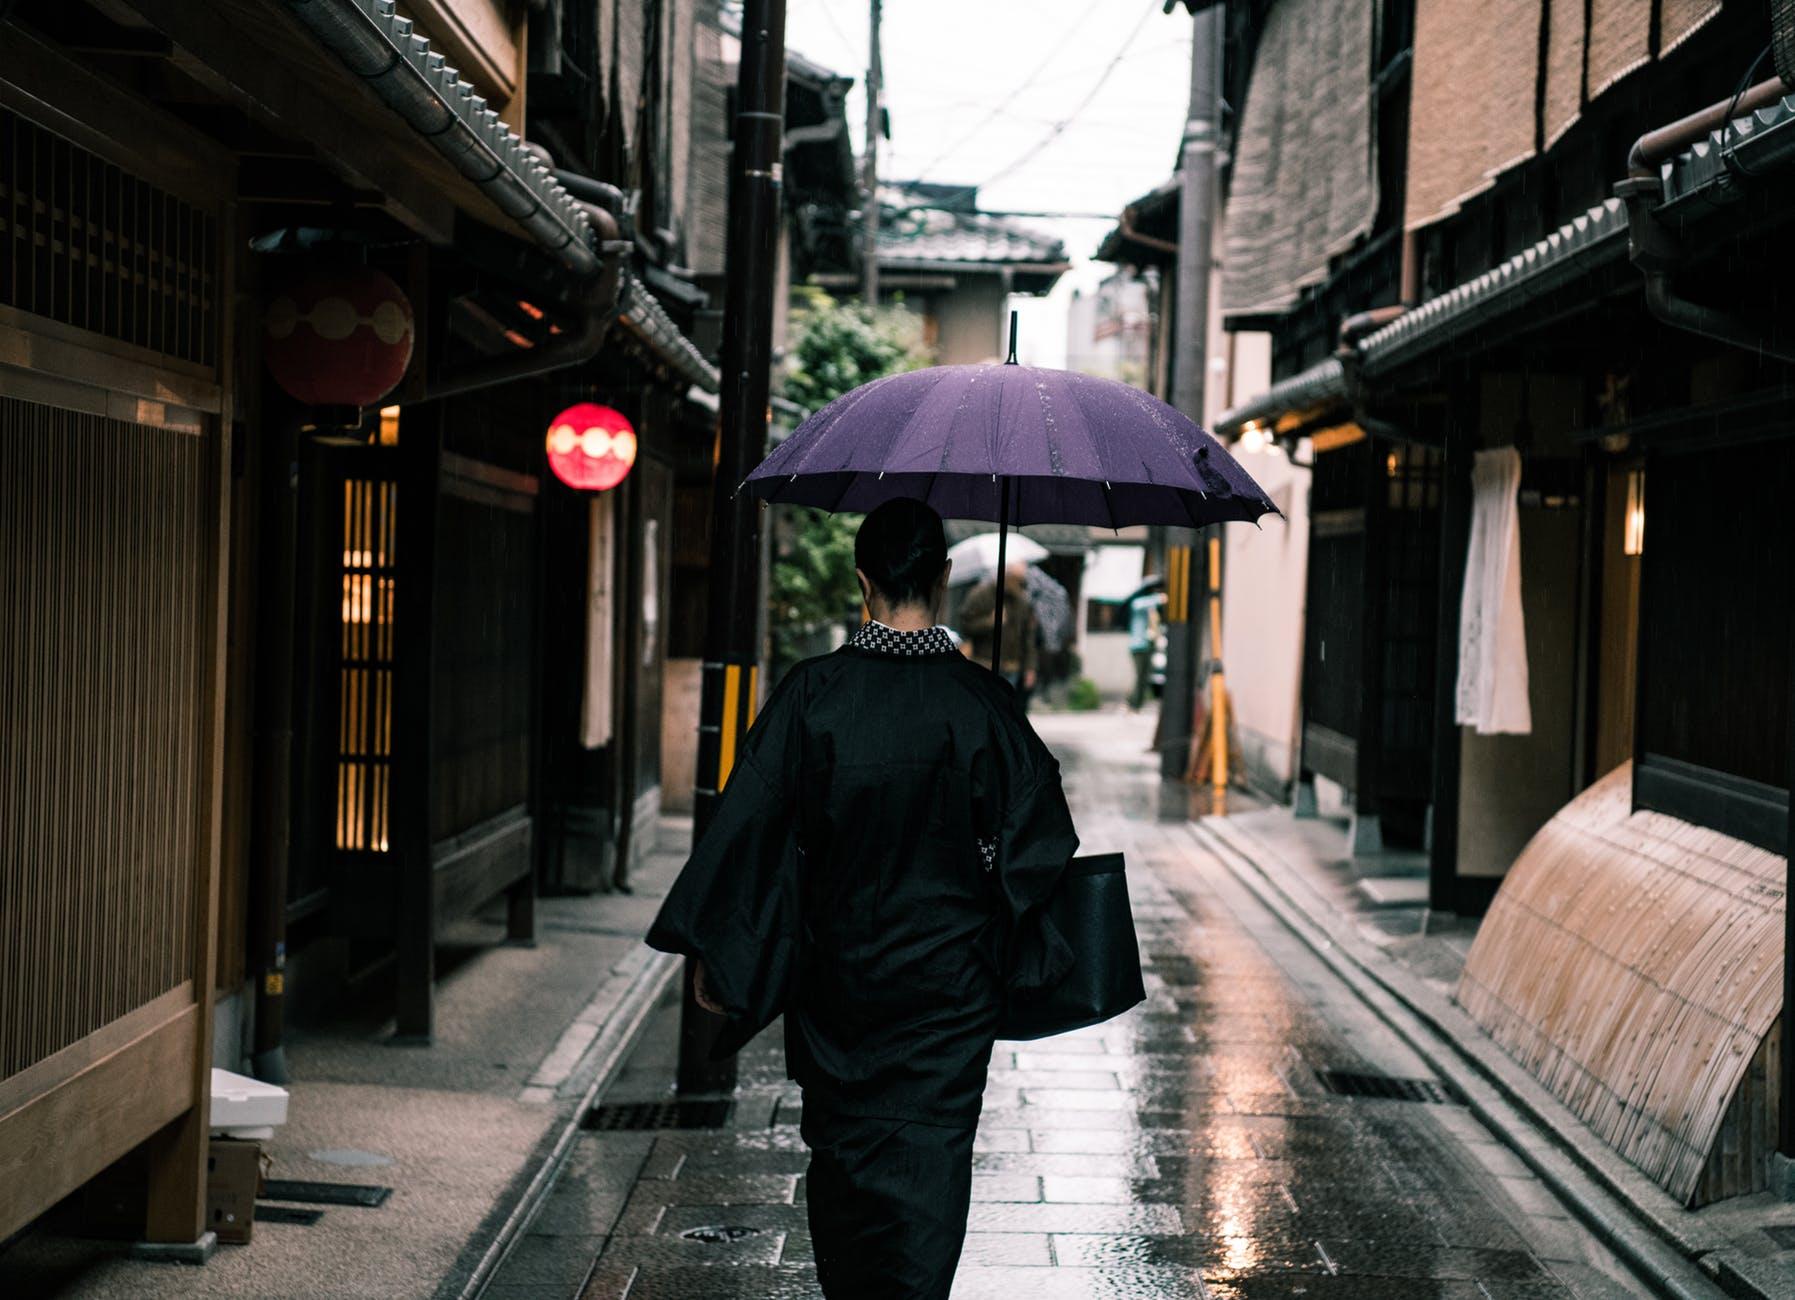 woman using purple umbrella walking in the street